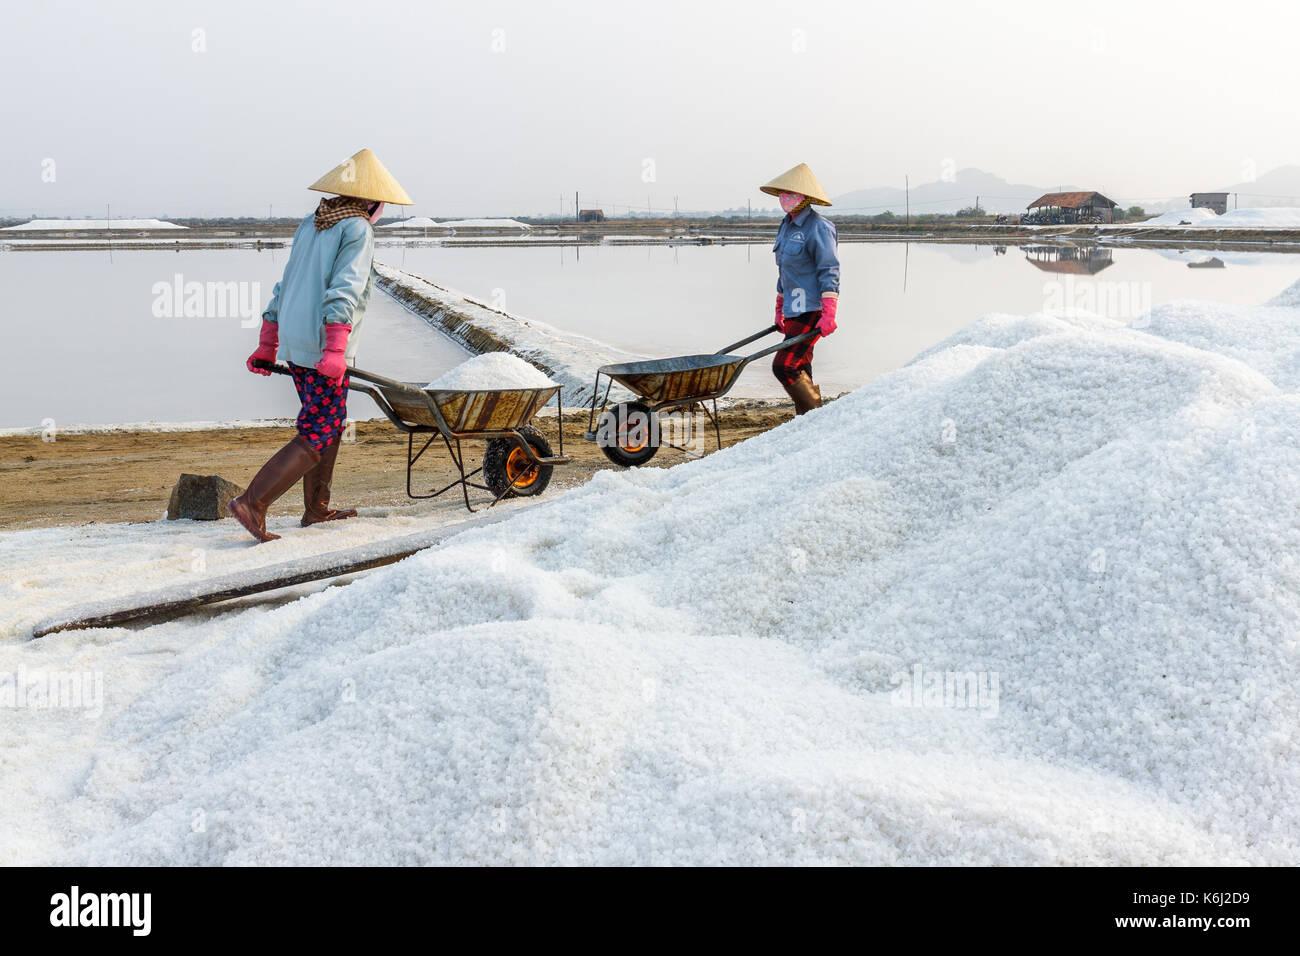 Workers push wheelbarrows at the Hon Khoi salt fields in Nha Trang, Vietnam. - Stock Image